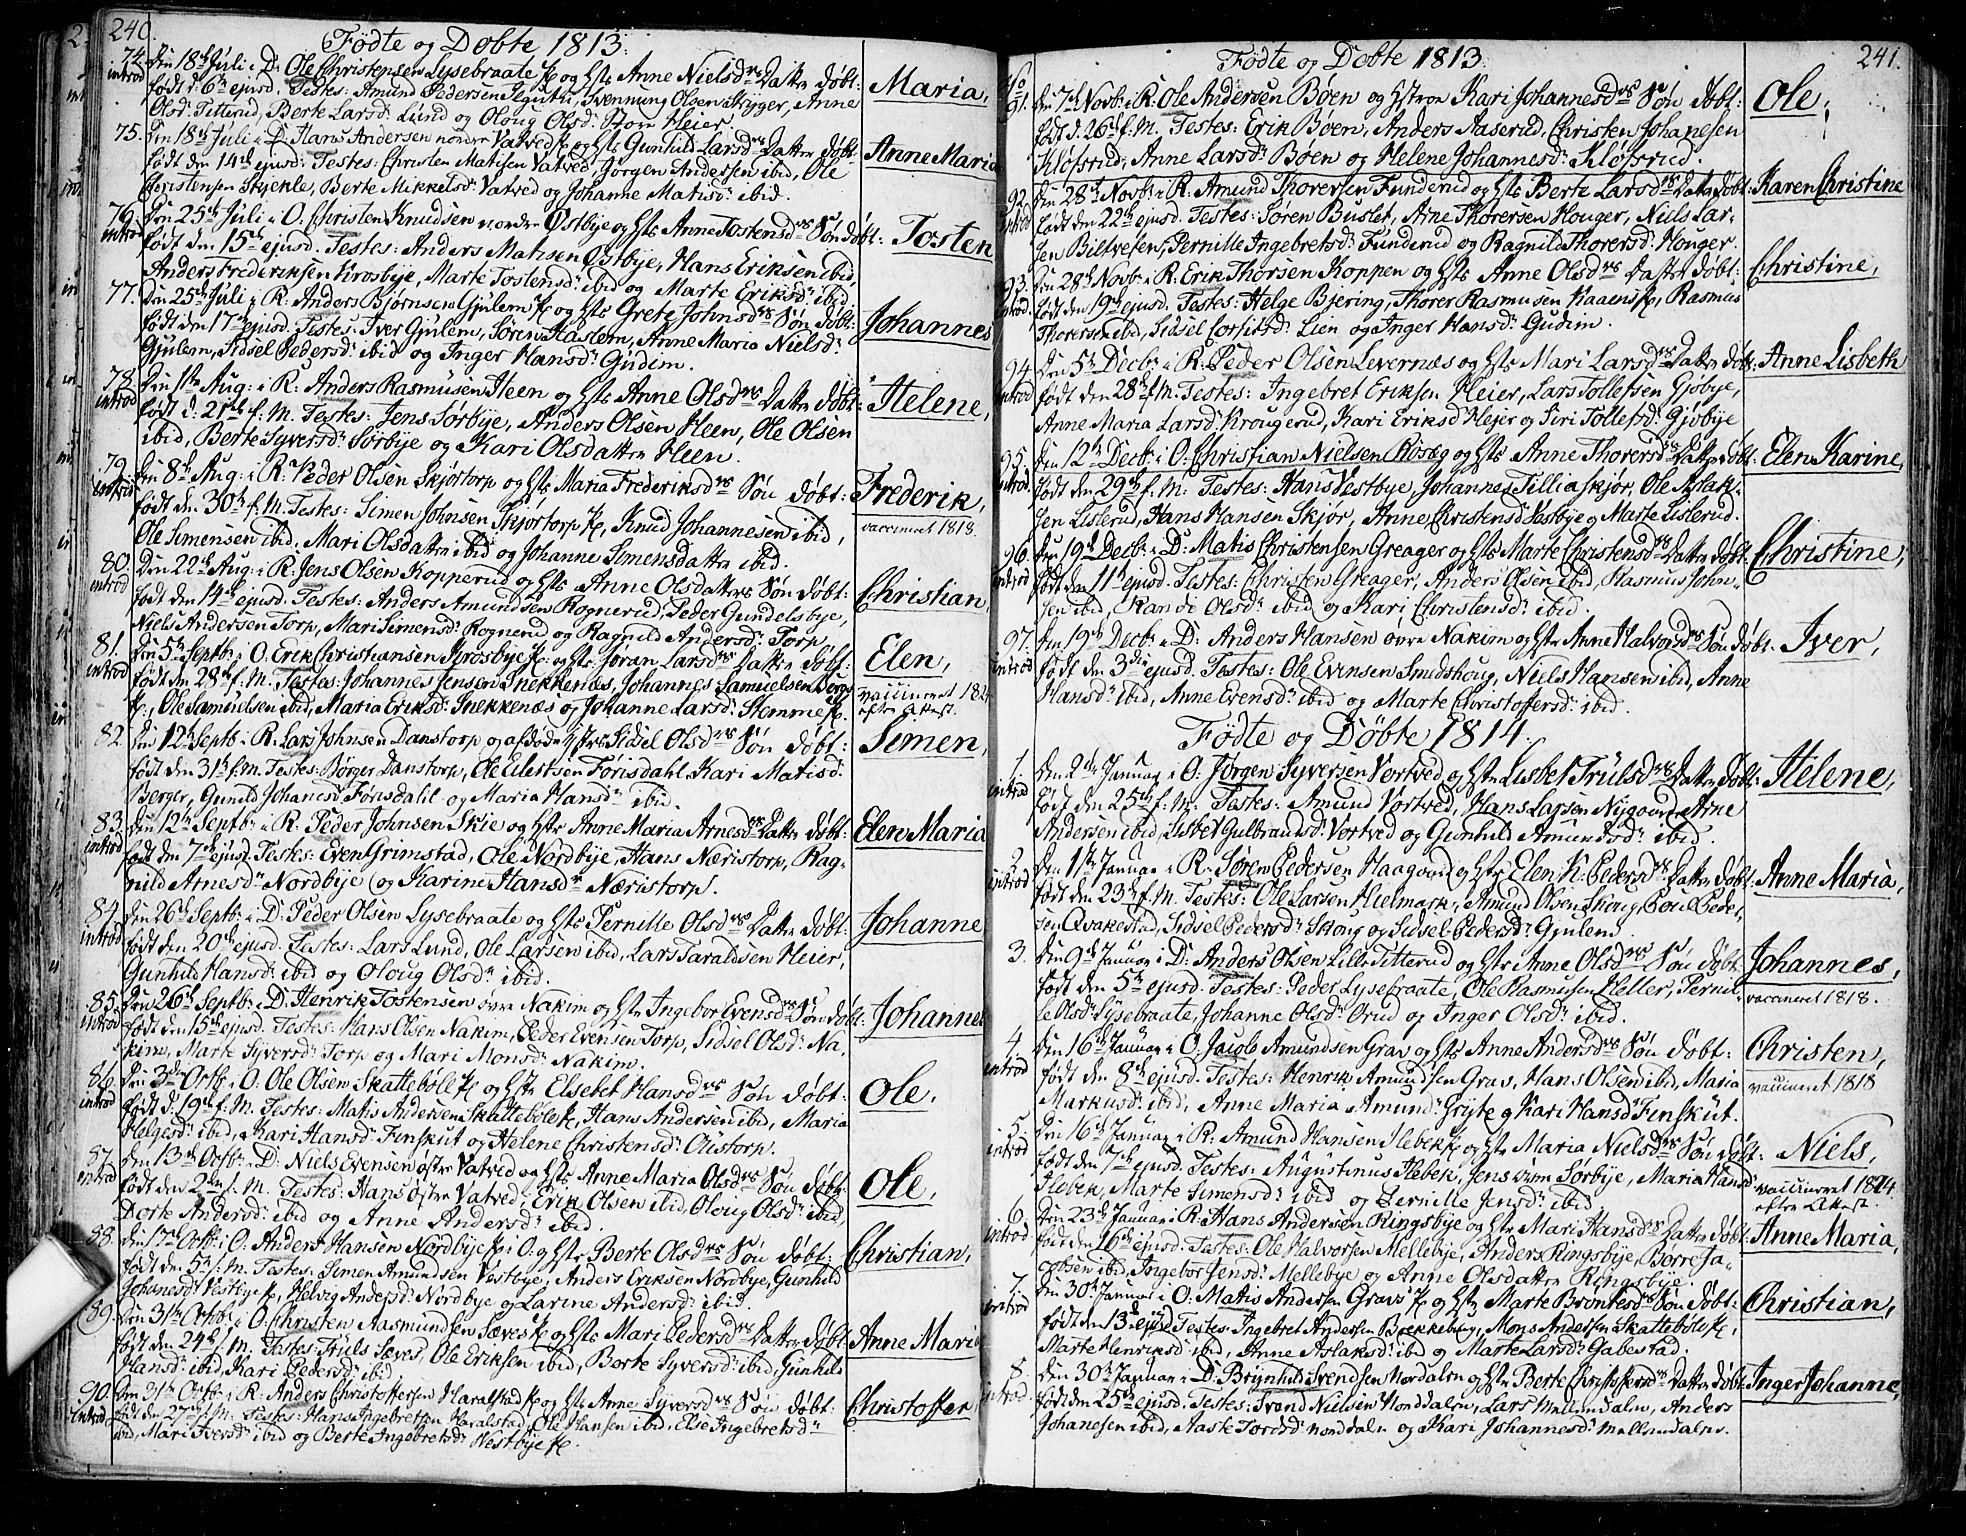 SAO, Rakkestad prestekontor Kirkebøker, F/Fa/L0005: Ministerialbok nr. I 5, 1784-1814, s. 240-241